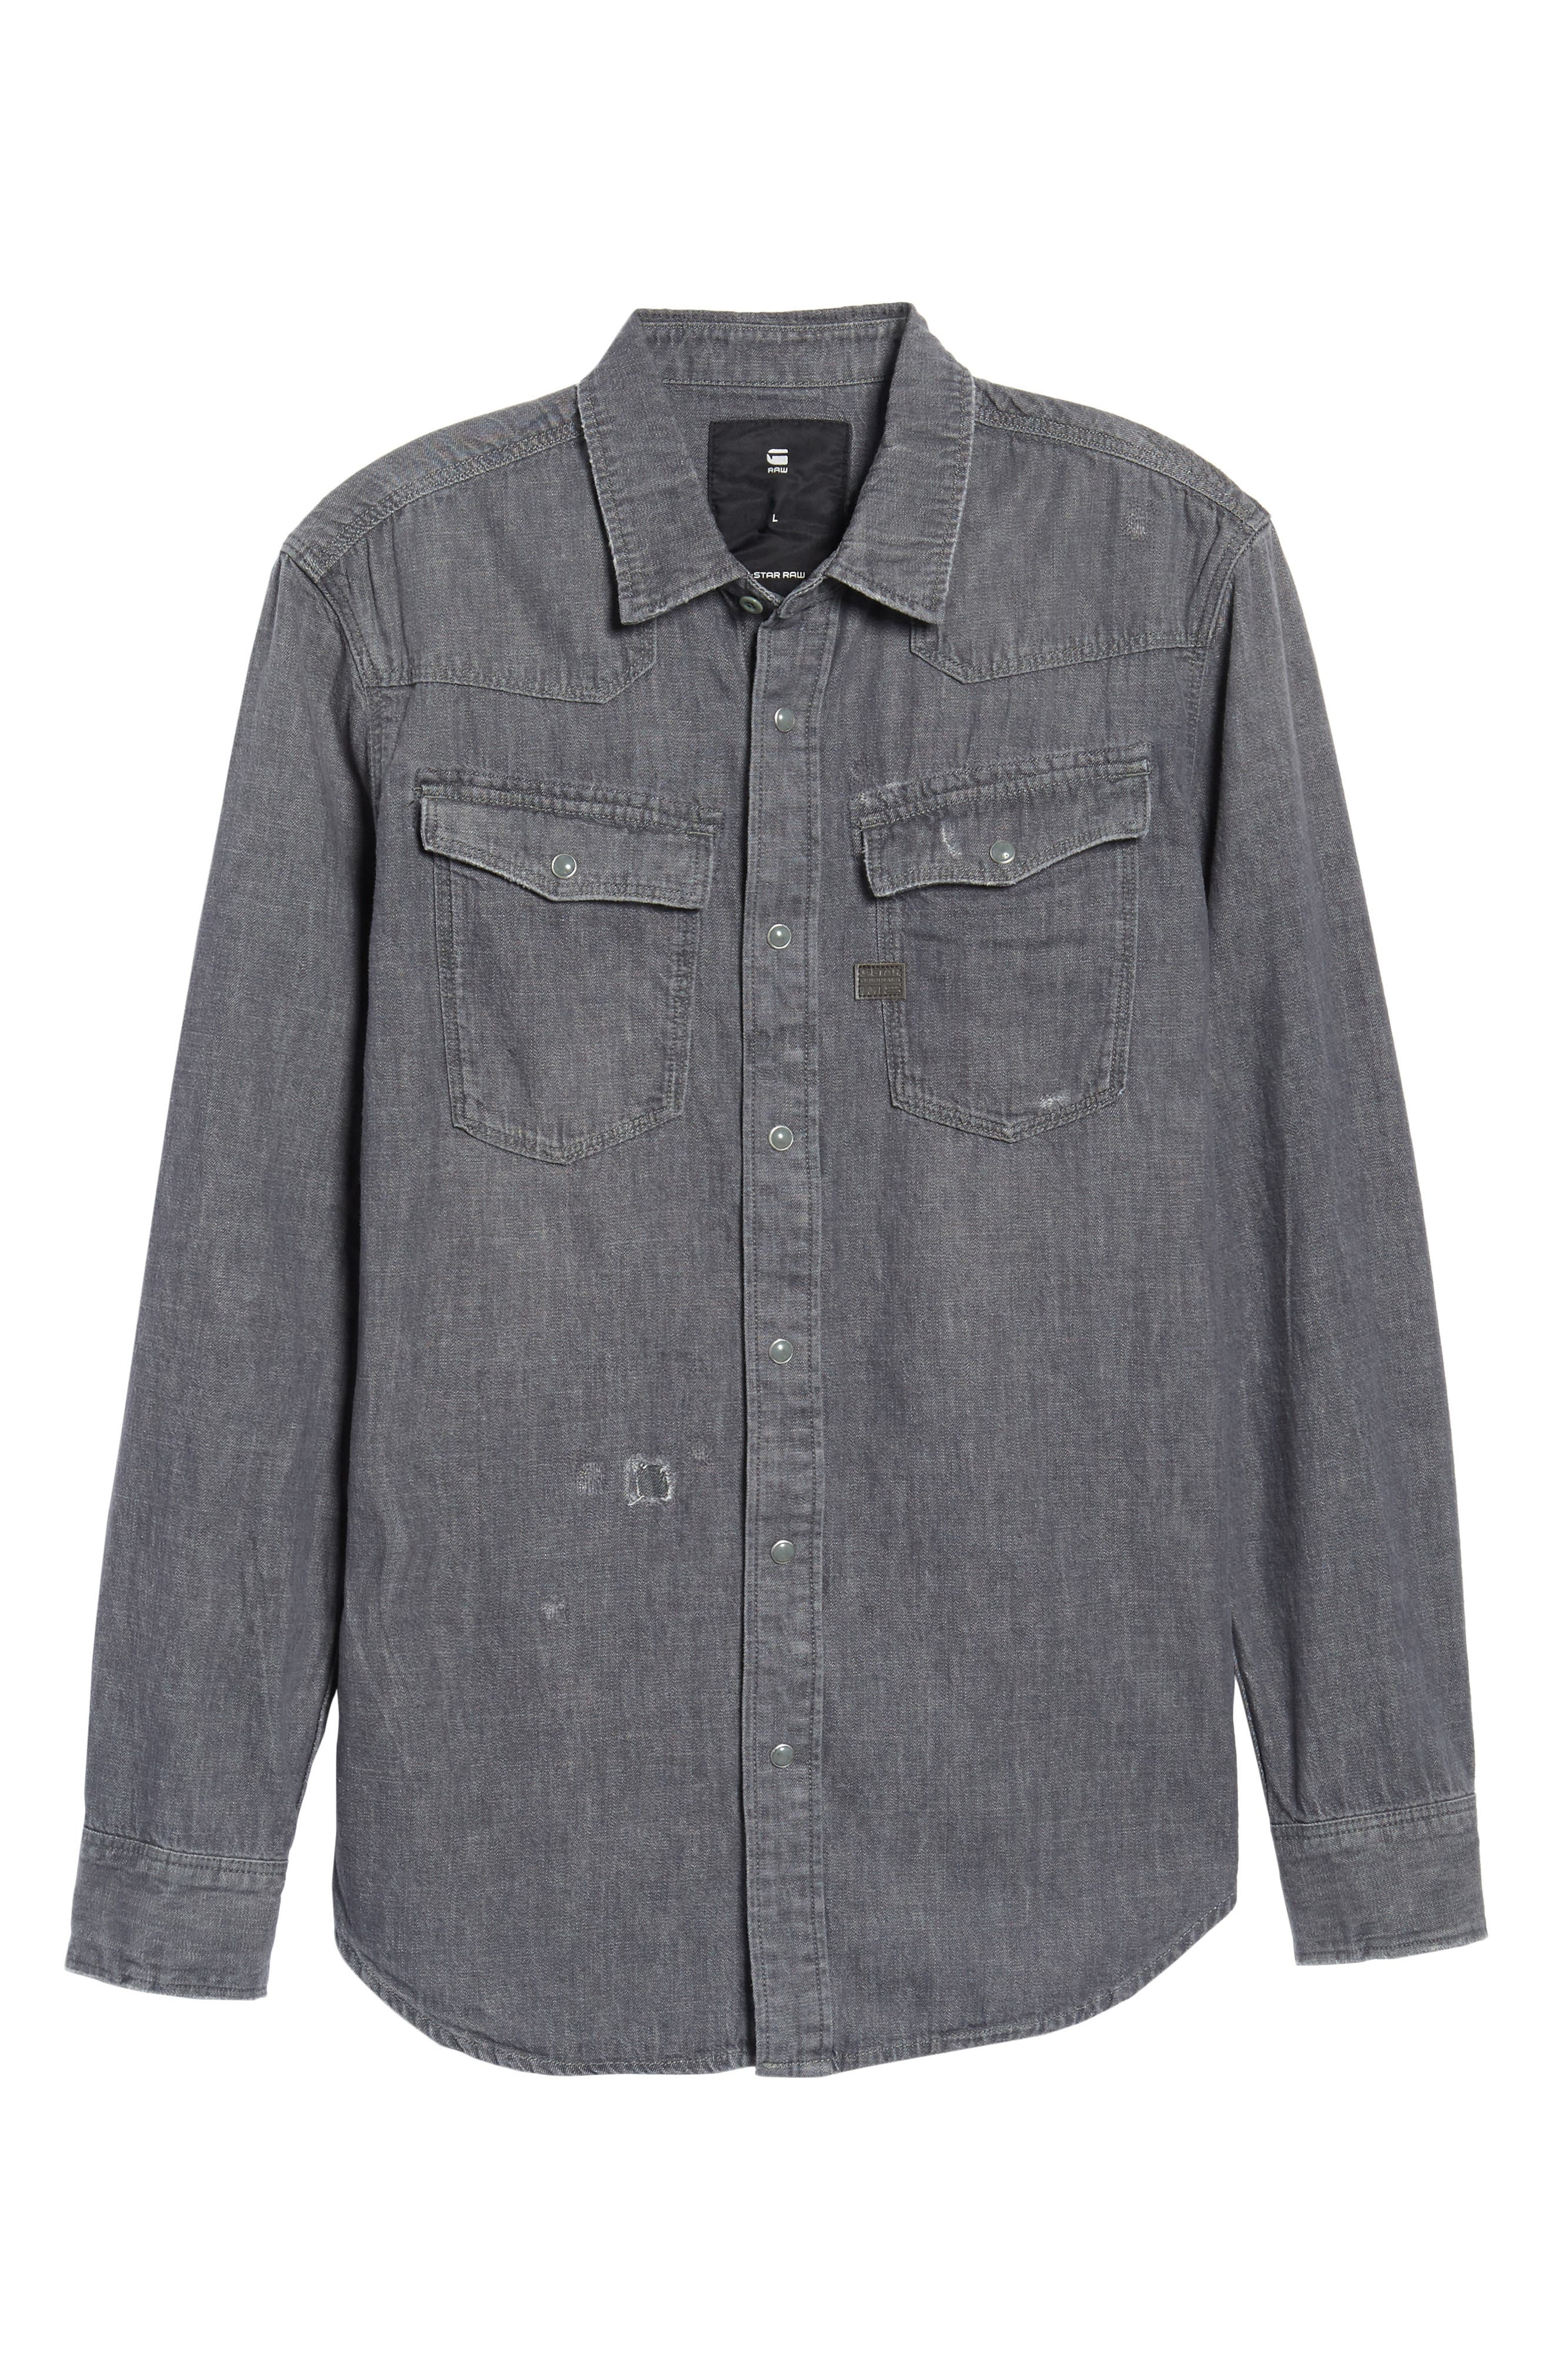 3301 Craser Denim Shirt,                             Alternate thumbnail 6, color,                             Medium Aged Restored